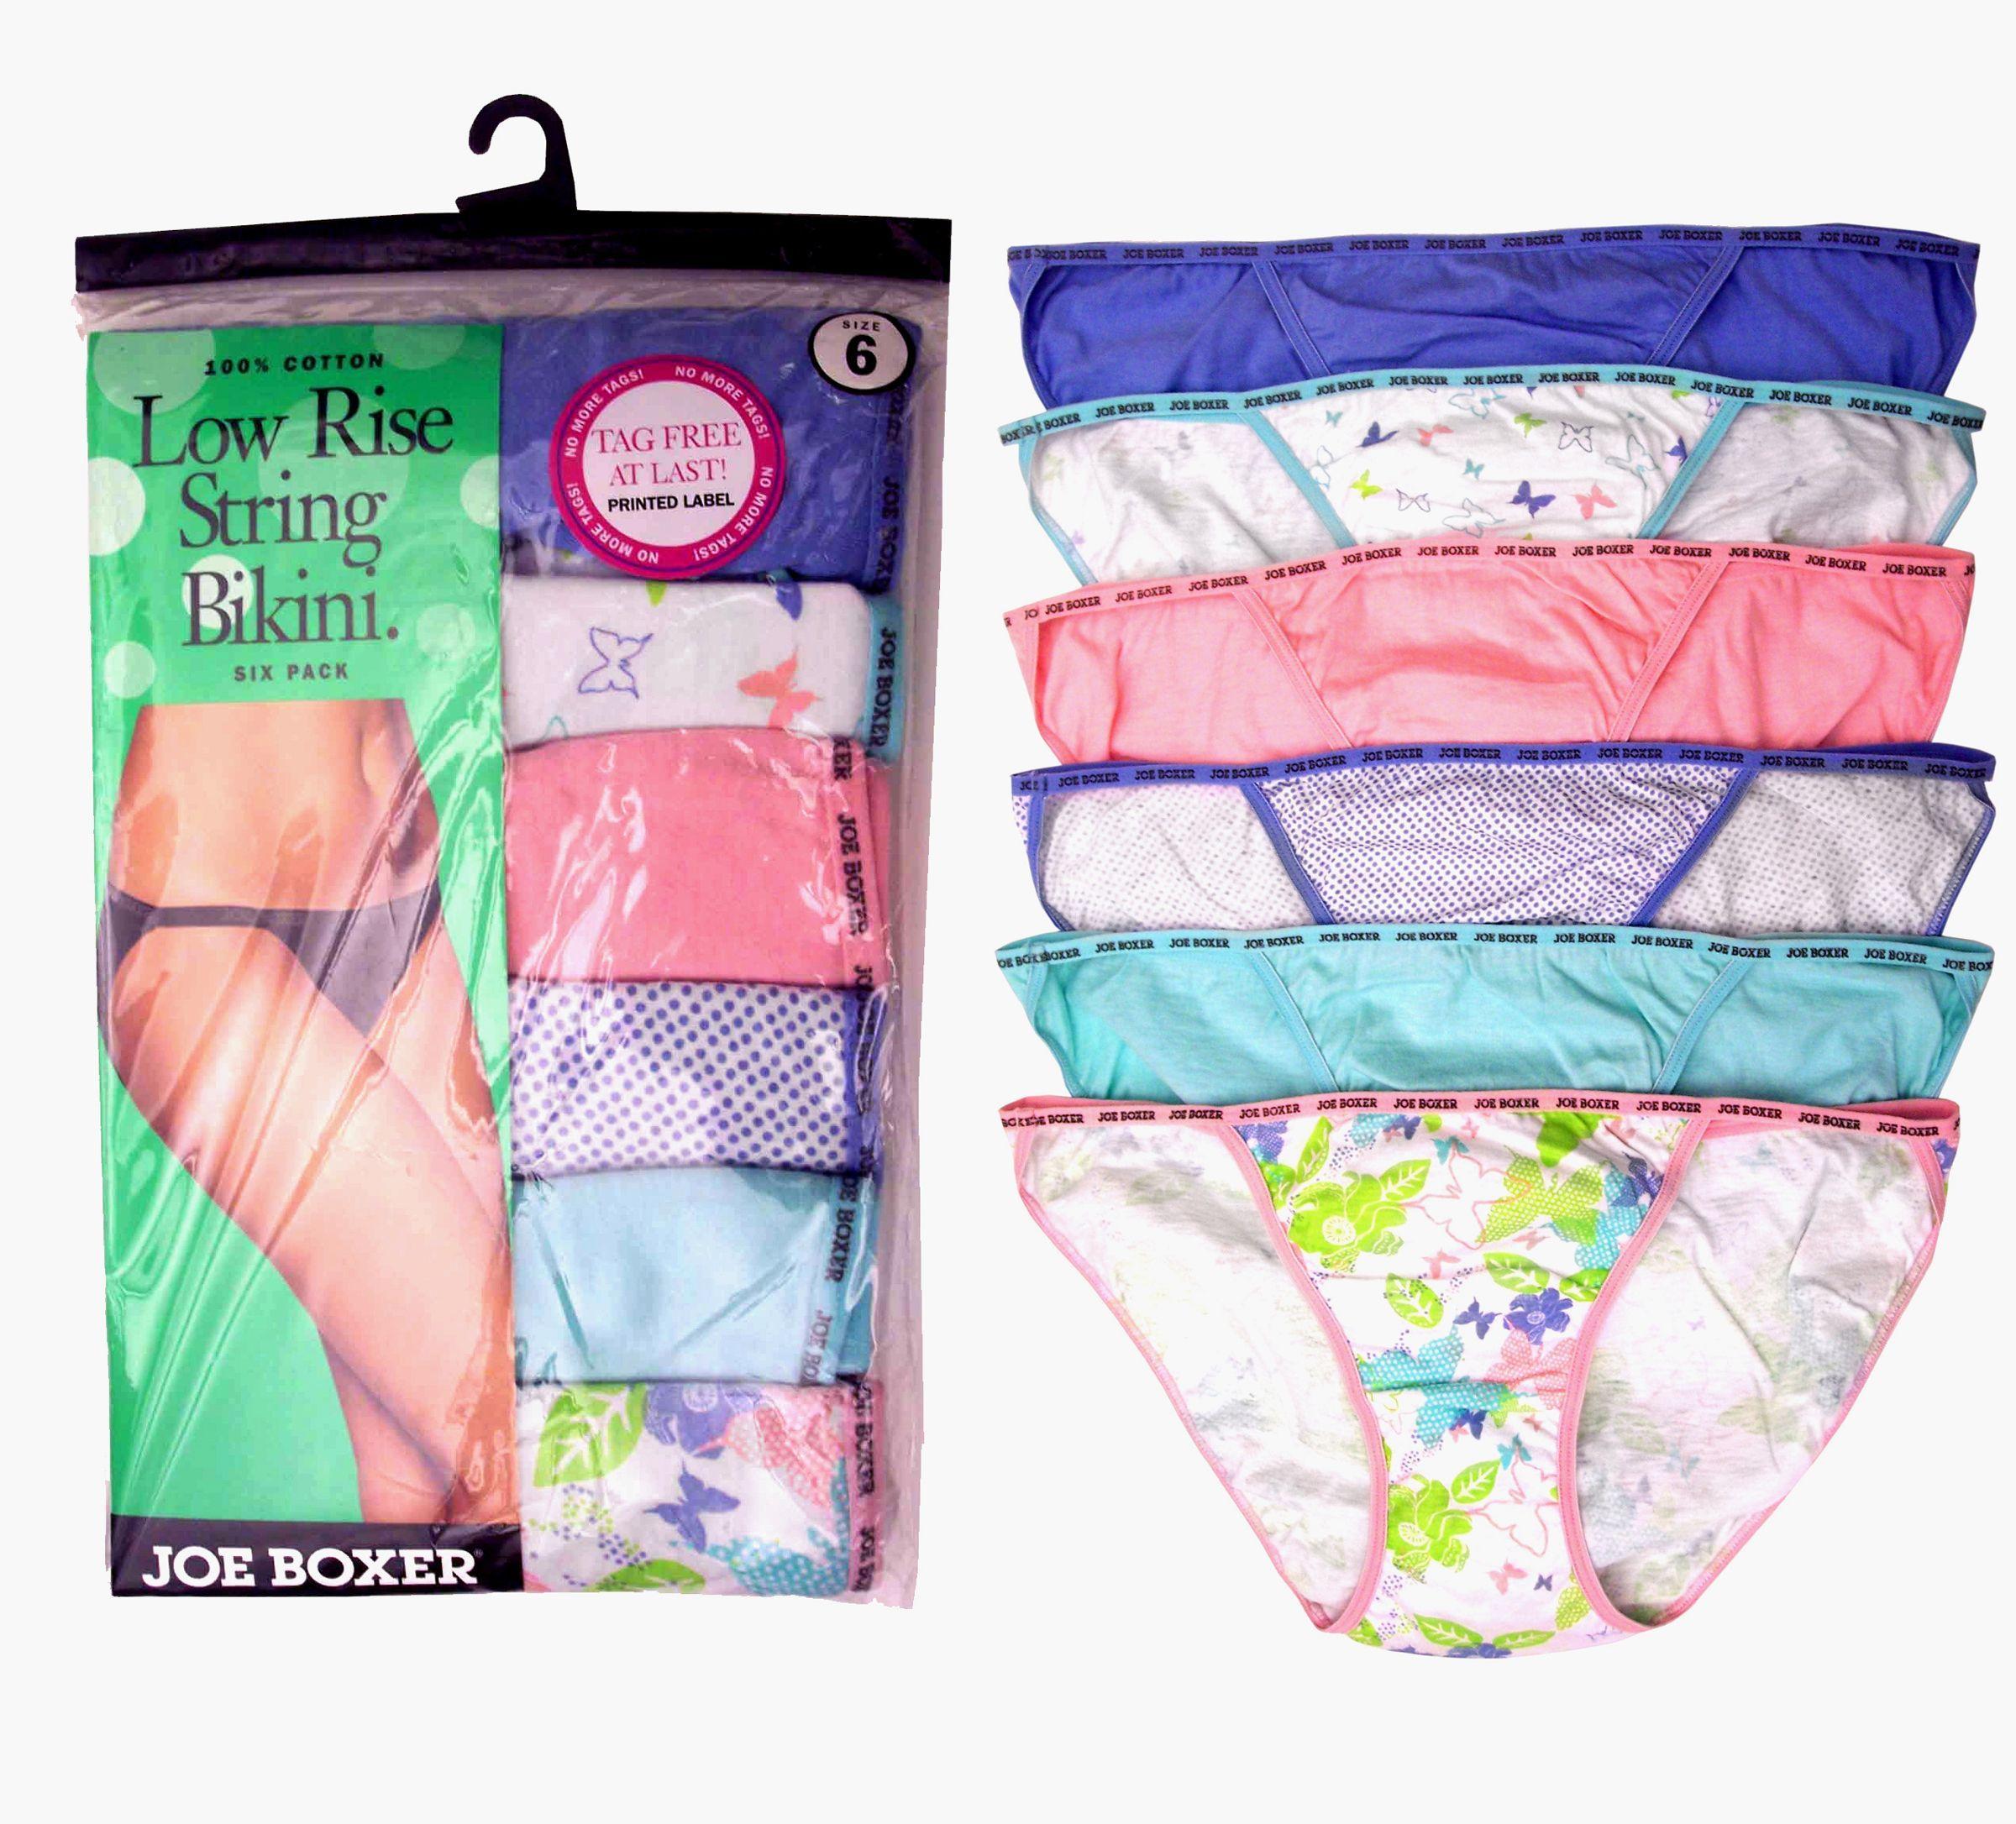 77a0e9e27f88 Joe Boxer Women's 6-pack Assorted LowRise String Bikinis | Ladies ...